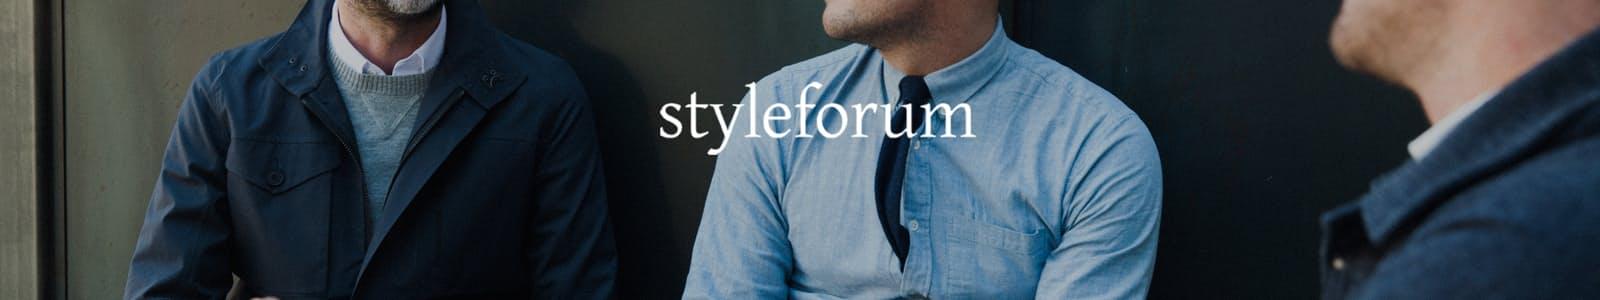 Styleforum banner.jpg?ixlib=rails 2.1